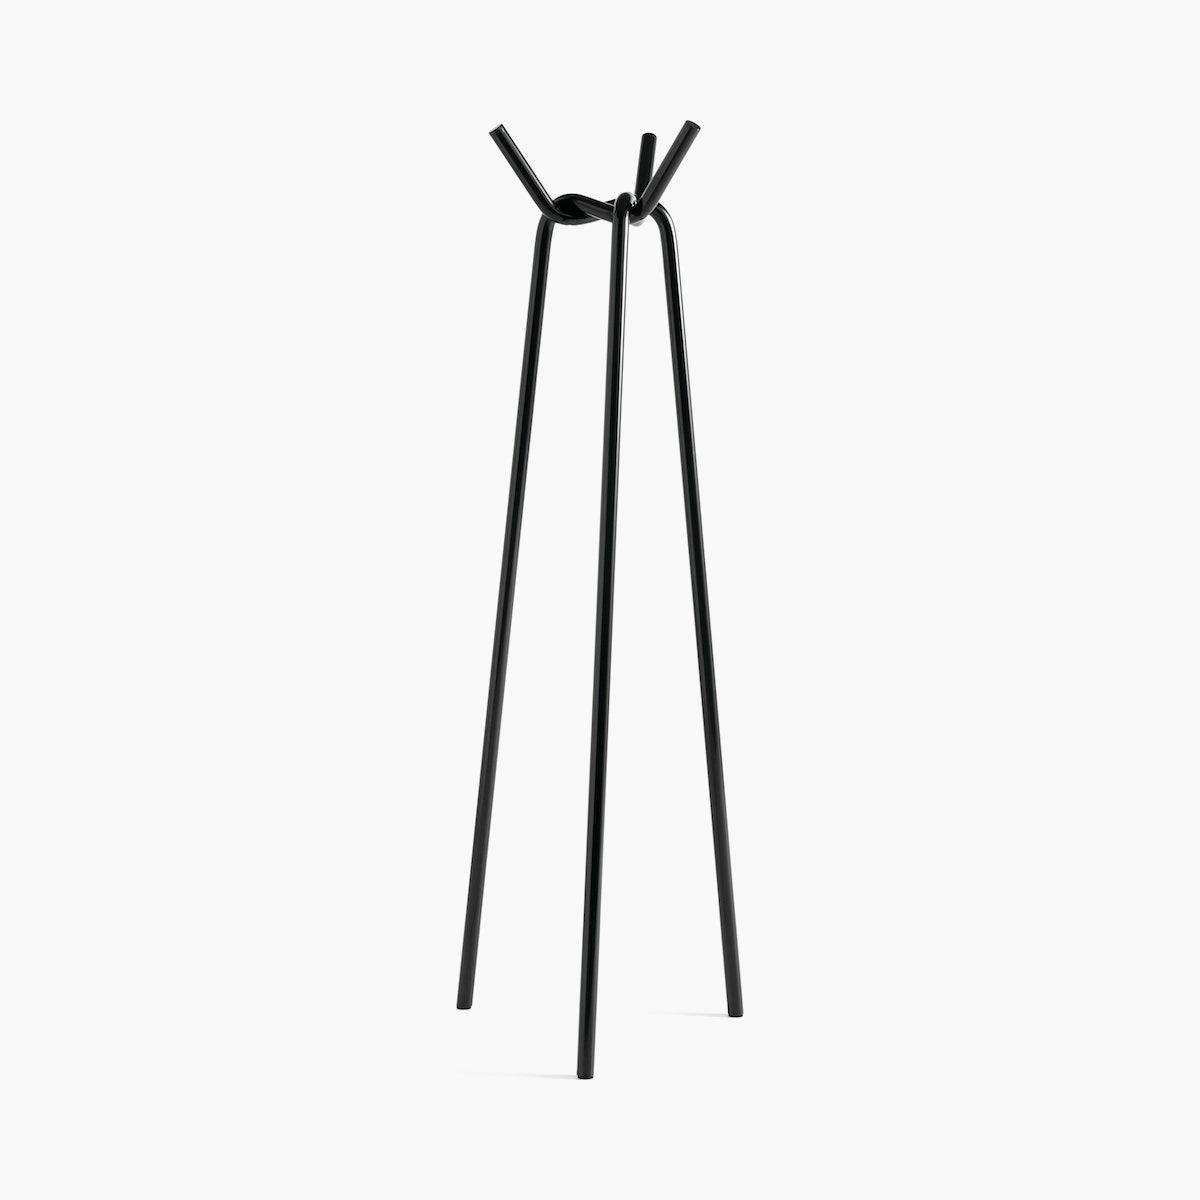 Knit Coat Rack